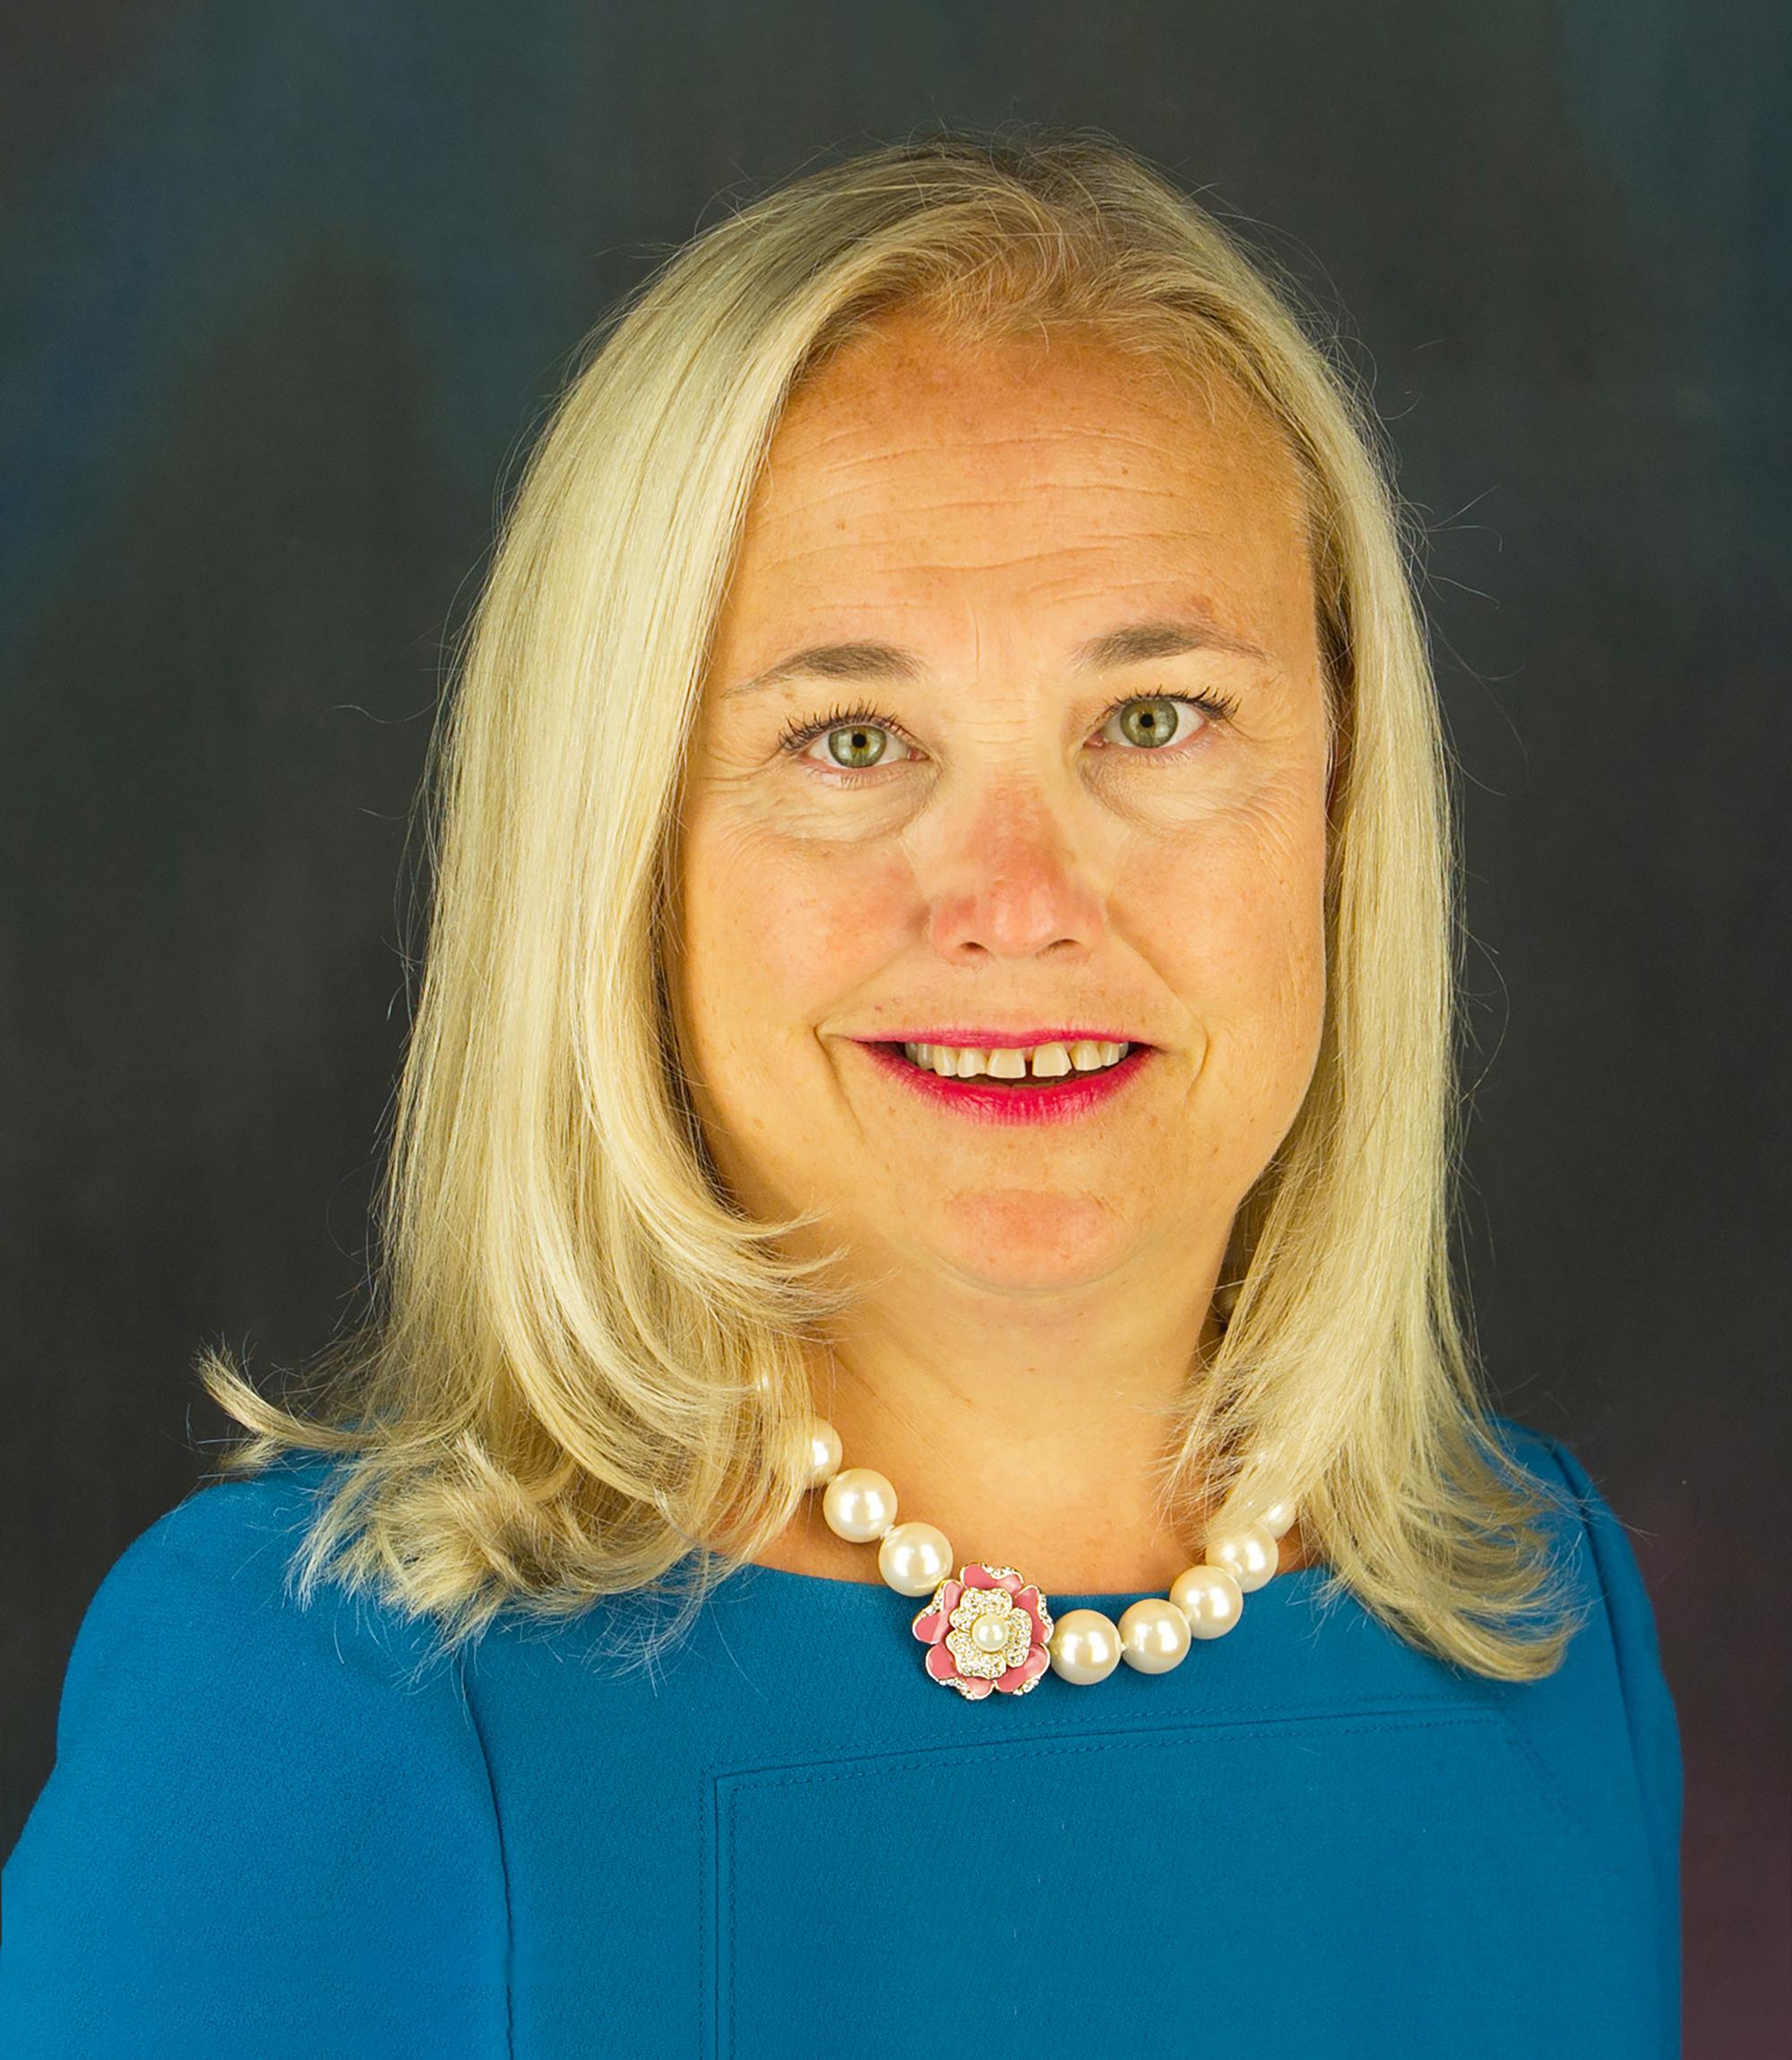 Gioia P. Bales, Professor of Finance at Hofstra